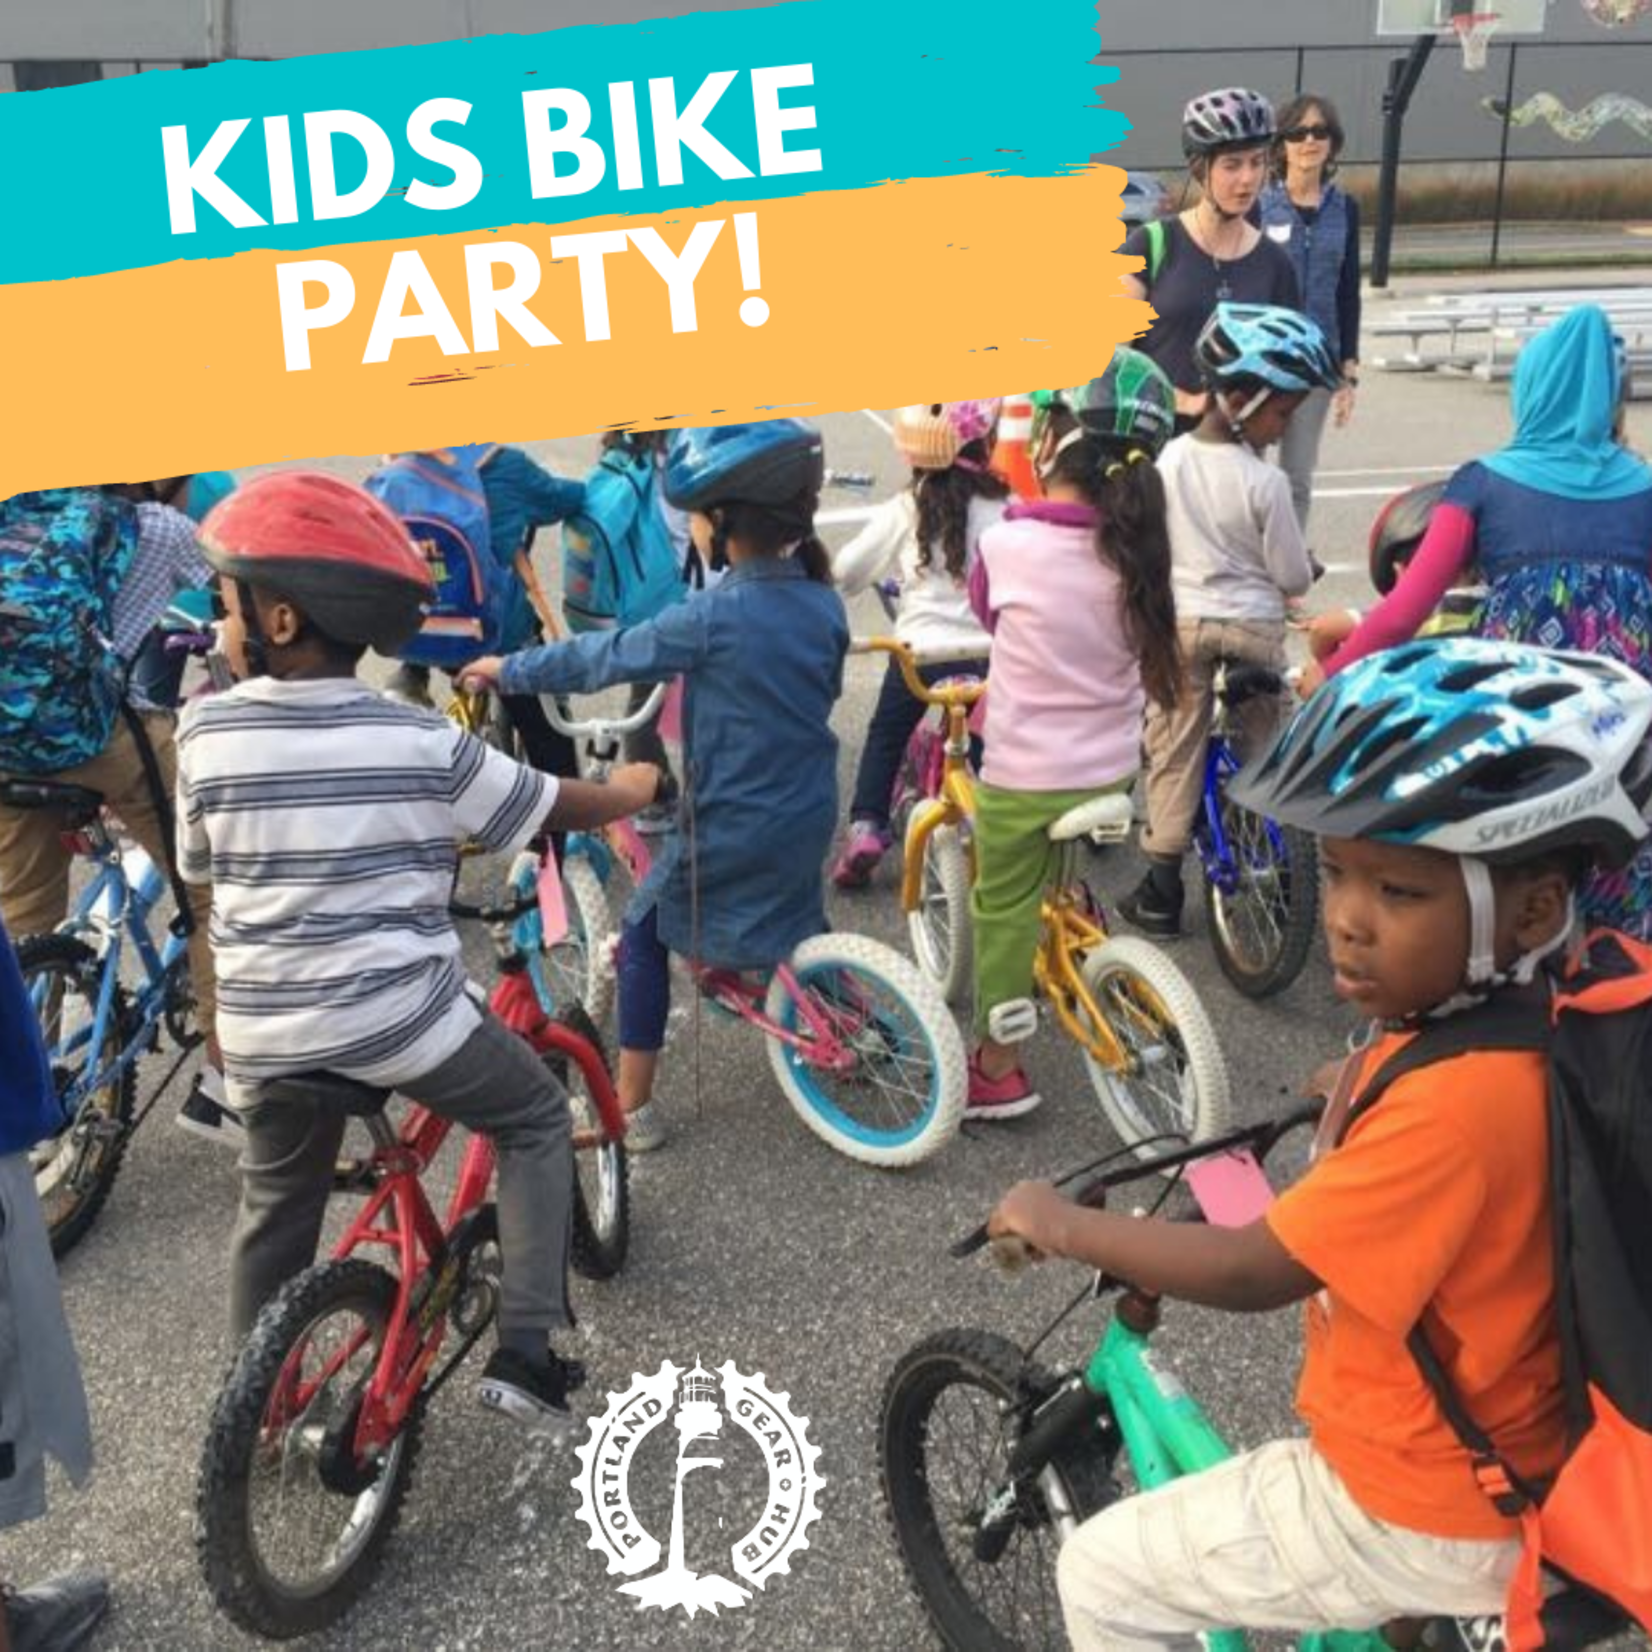 Kids Bike Party: June 5, 10:00am -1:00pm